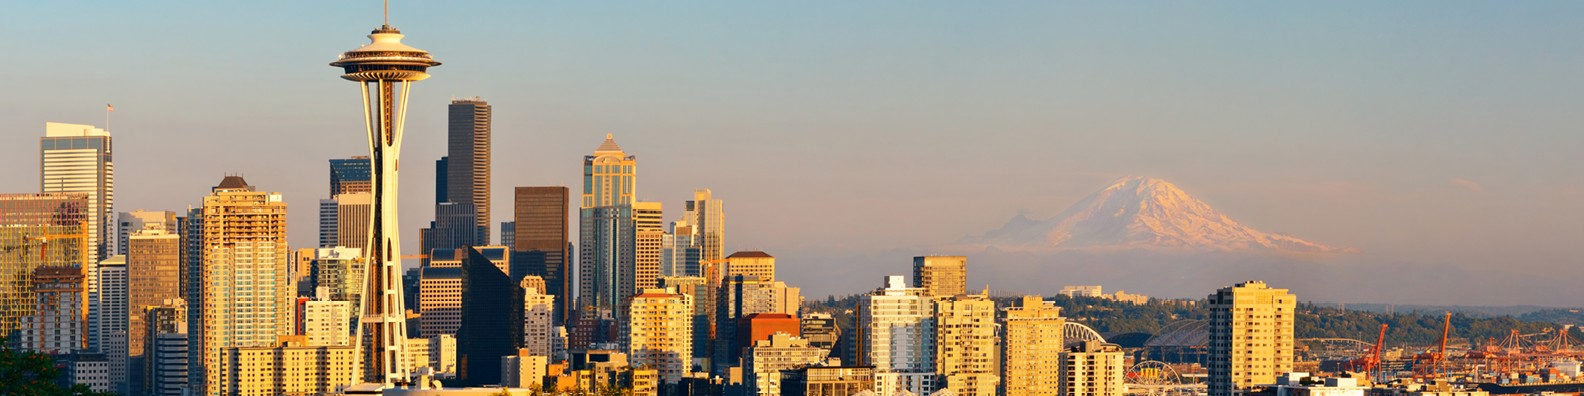 Polymershapes Seattle | LinkedIn